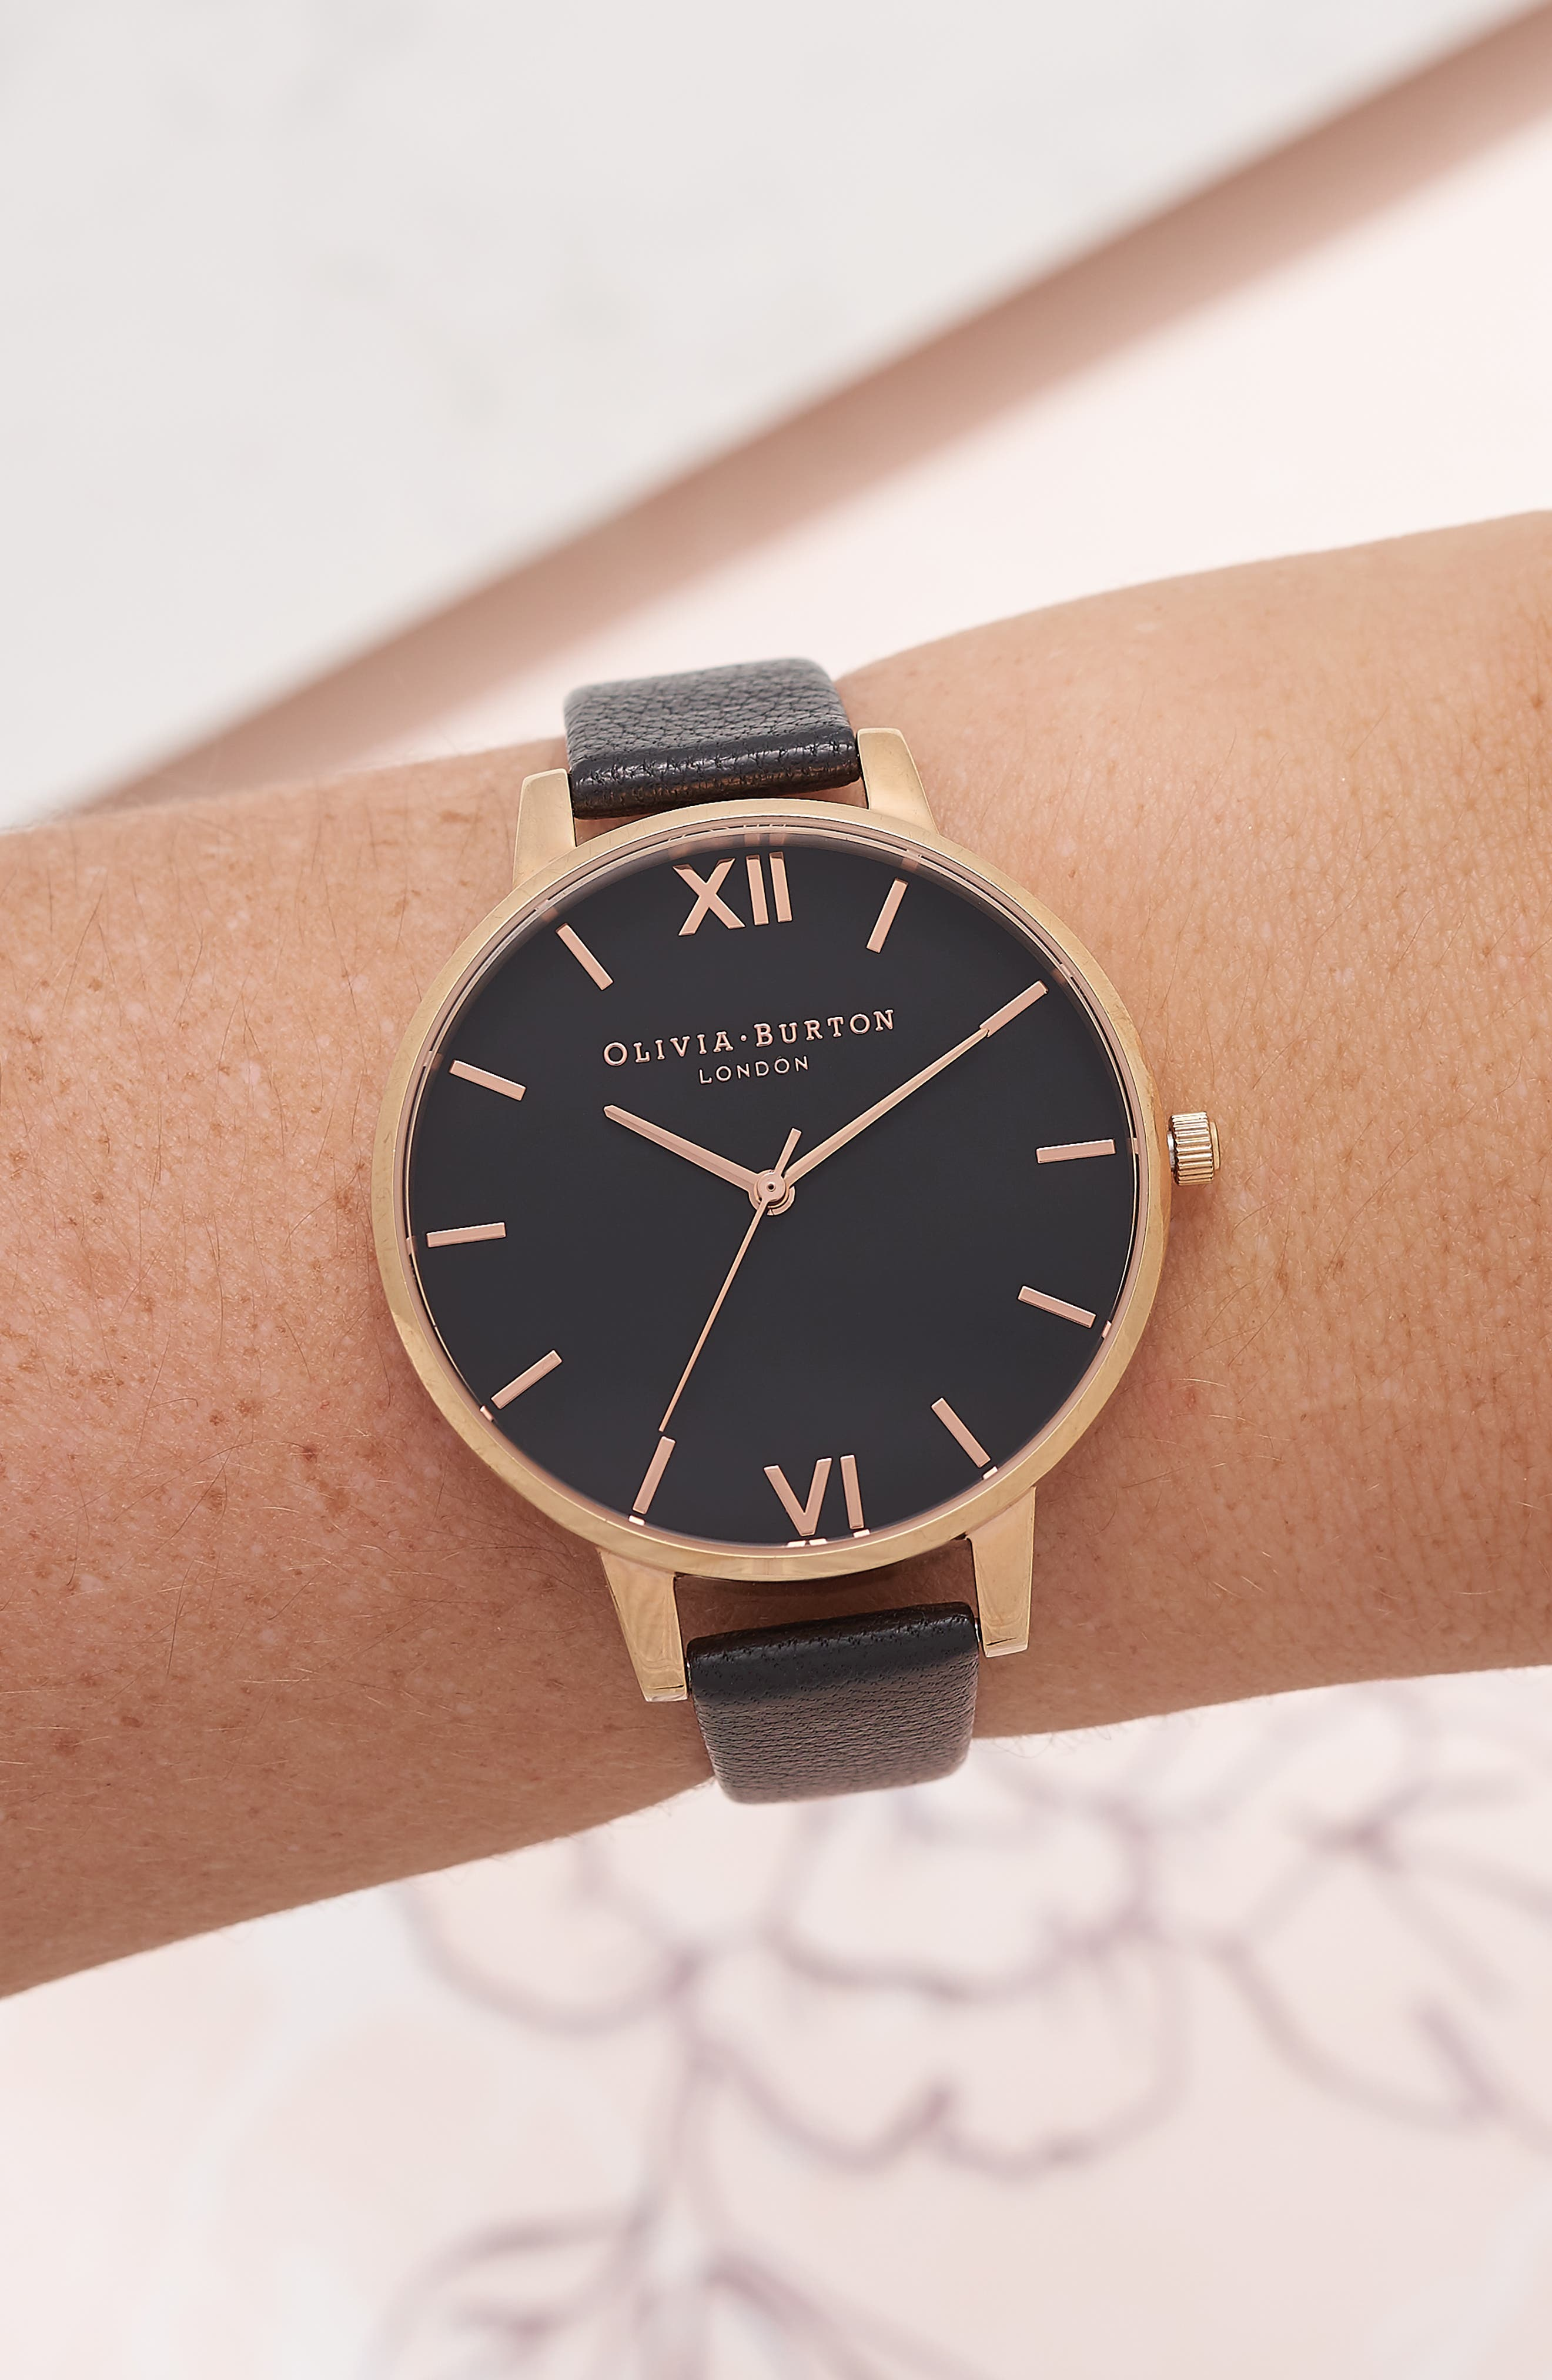 OLIVIA BURTON, Big Dial Leather Strap Watch, 38mm, Alternate thumbnail 2, color, BLACK/ BLACK/ ROSE GOLD